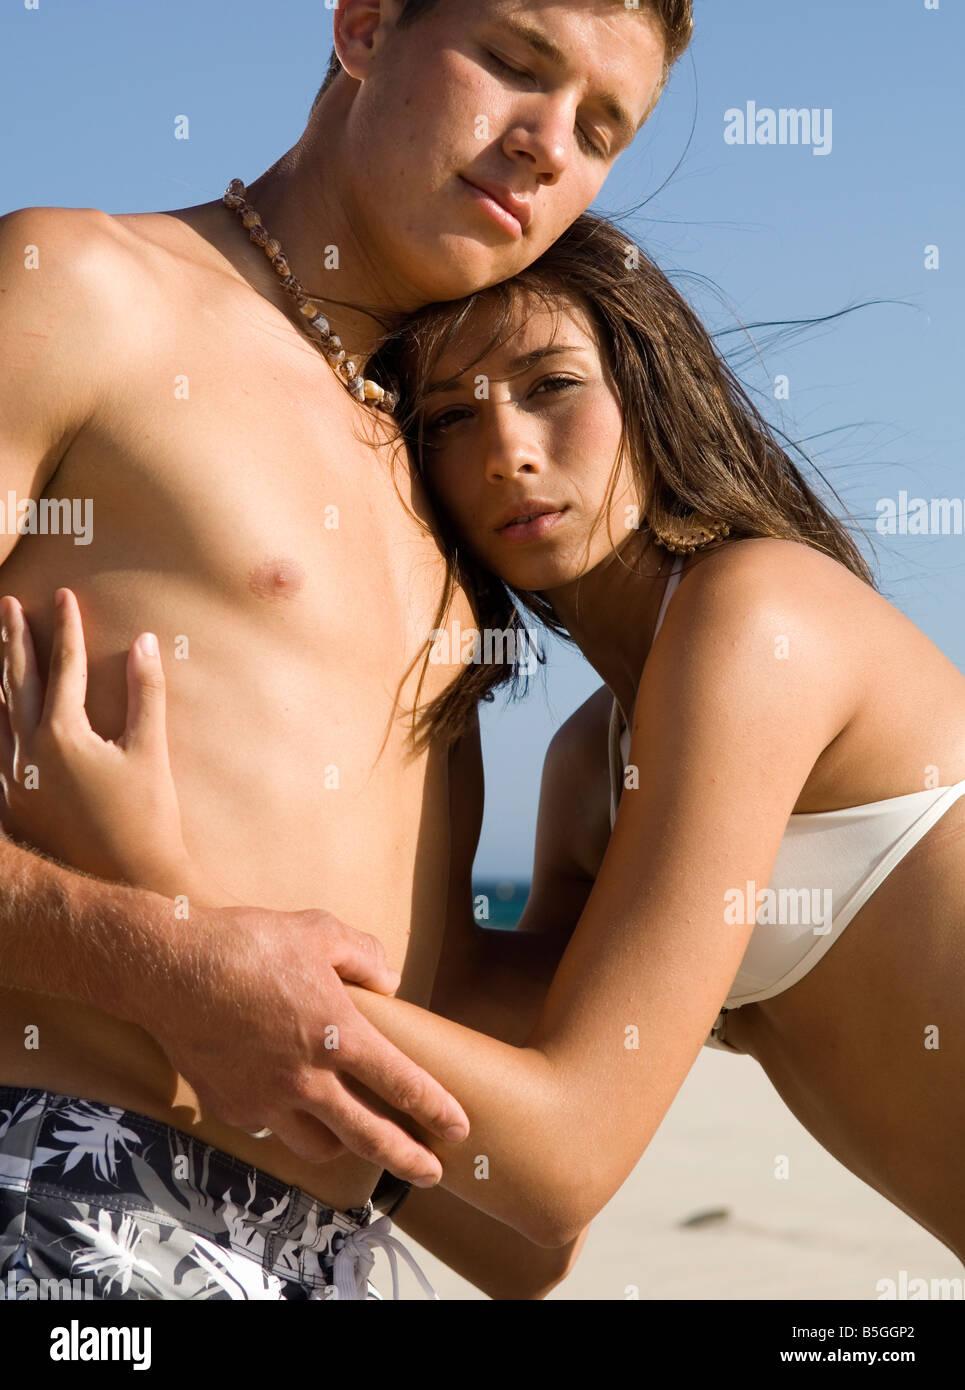 frisch Verliebte umarmen Stockbild